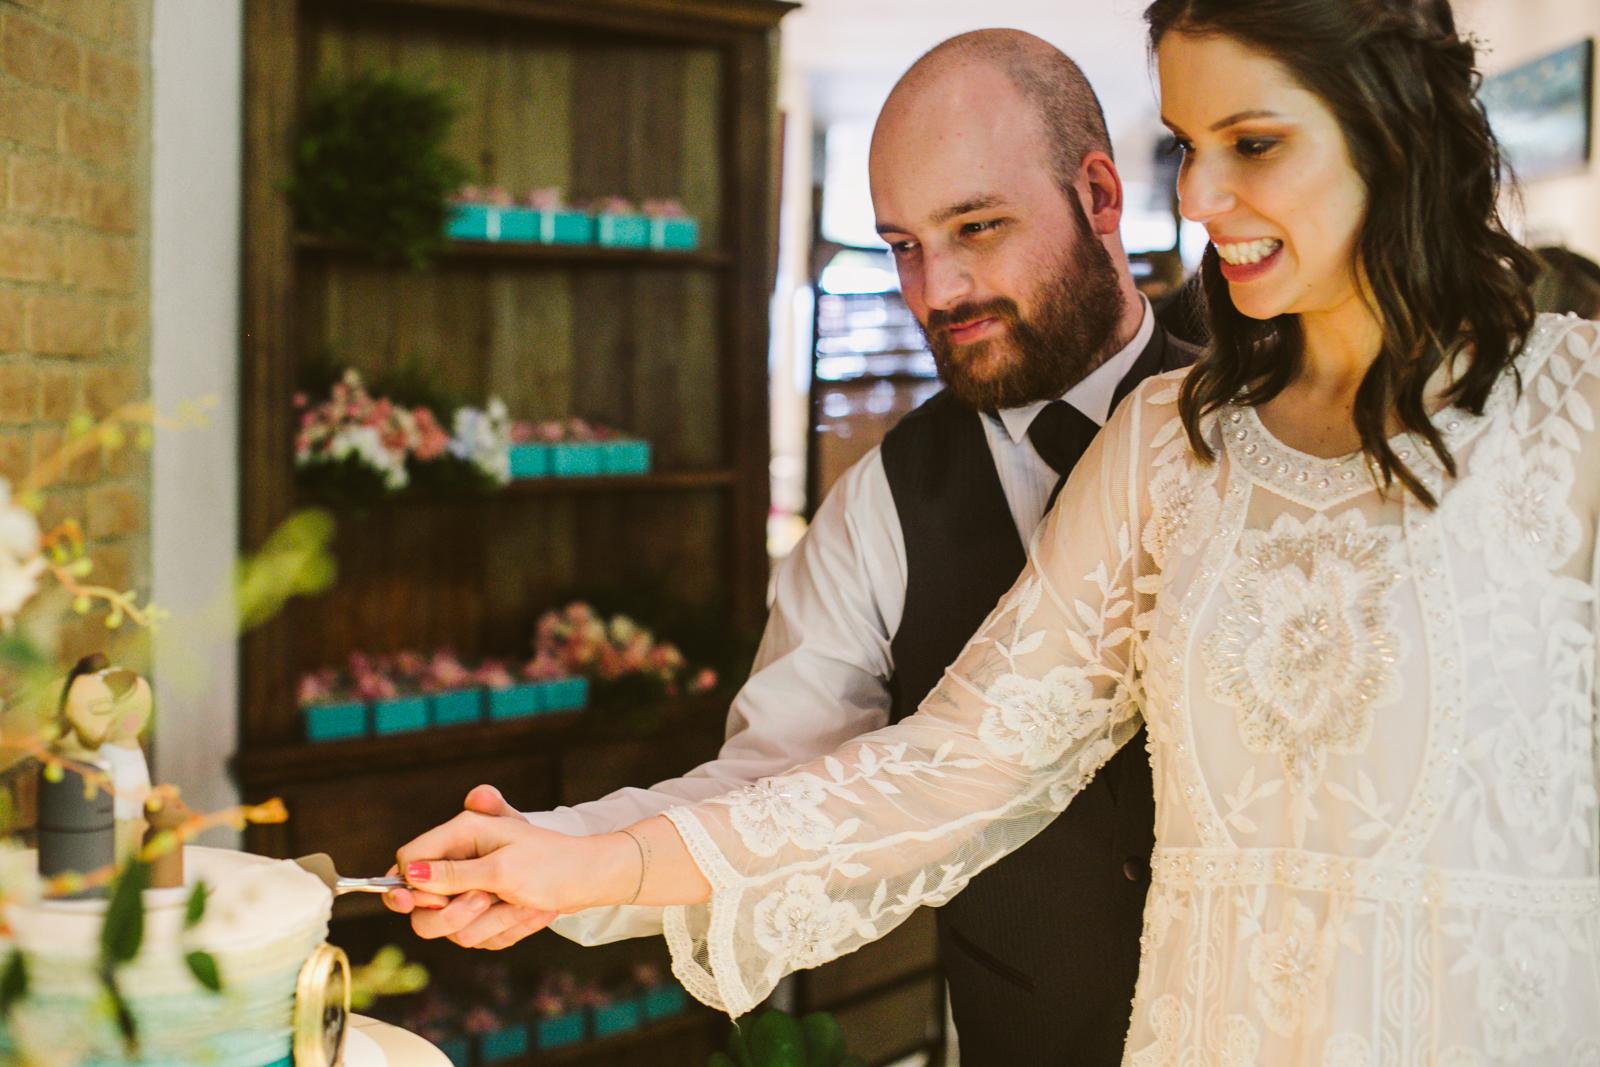 Casamento simples mostra que o amor é o que conta 9